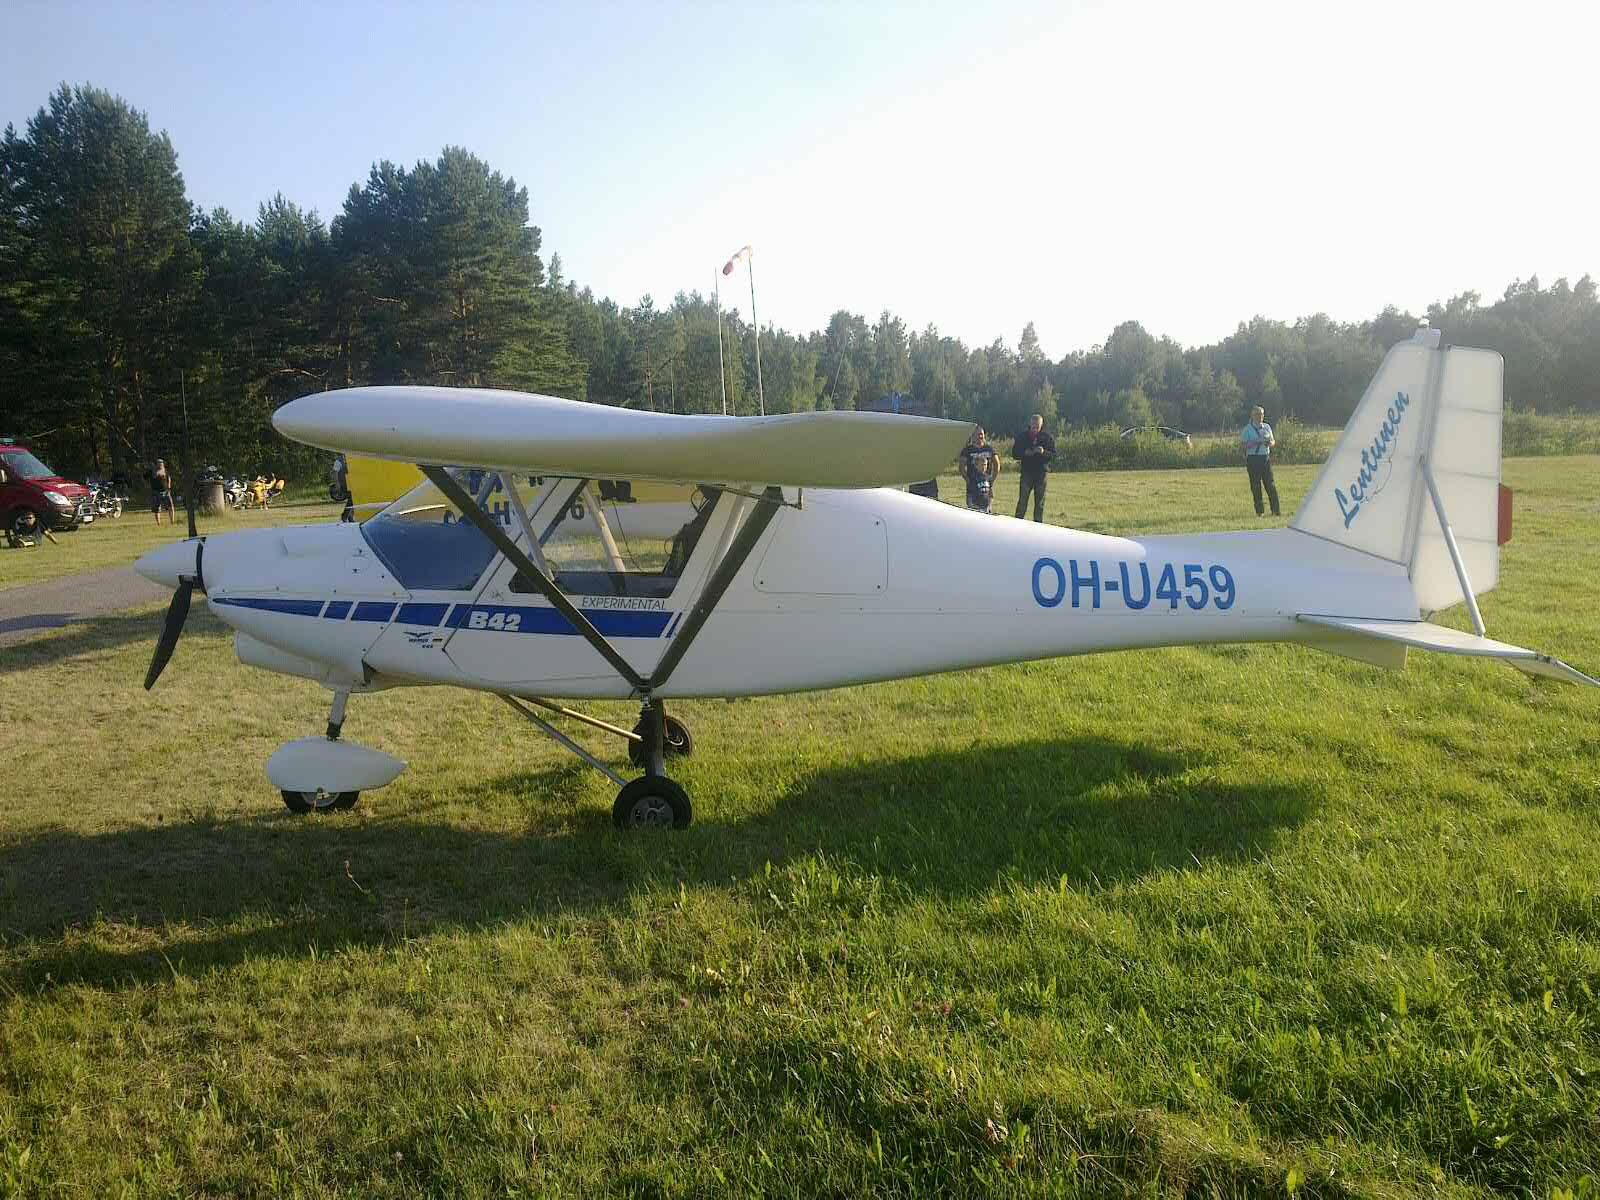 Ikarus C-42 OH-U459 EFHN 2017-08-08